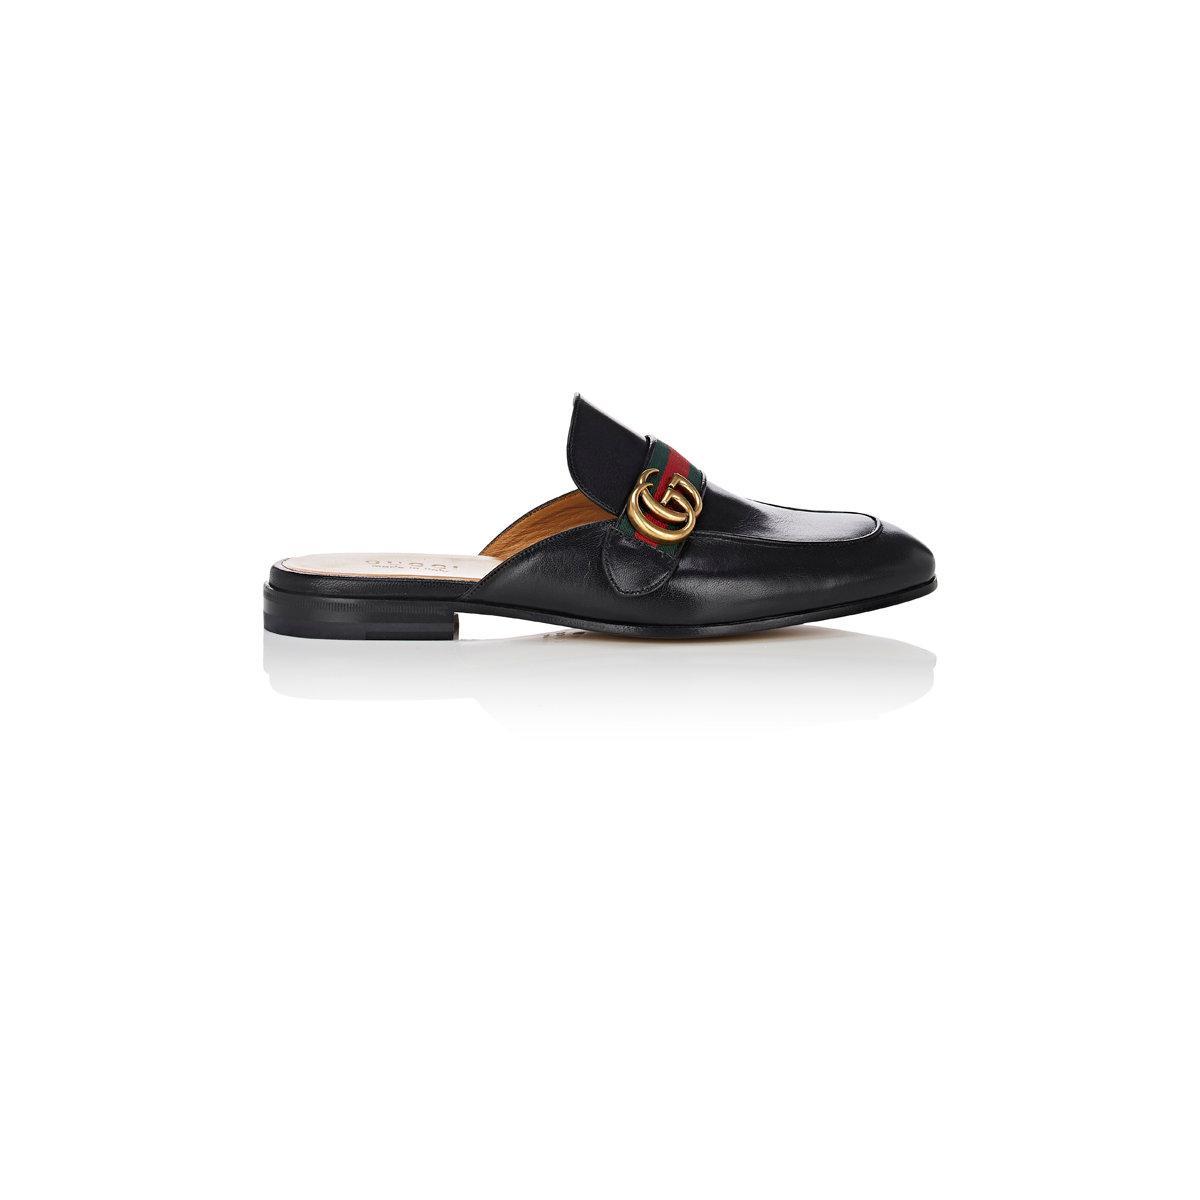 Kings Horsebit Leather Backless Loafers Gucci 1KsuHki